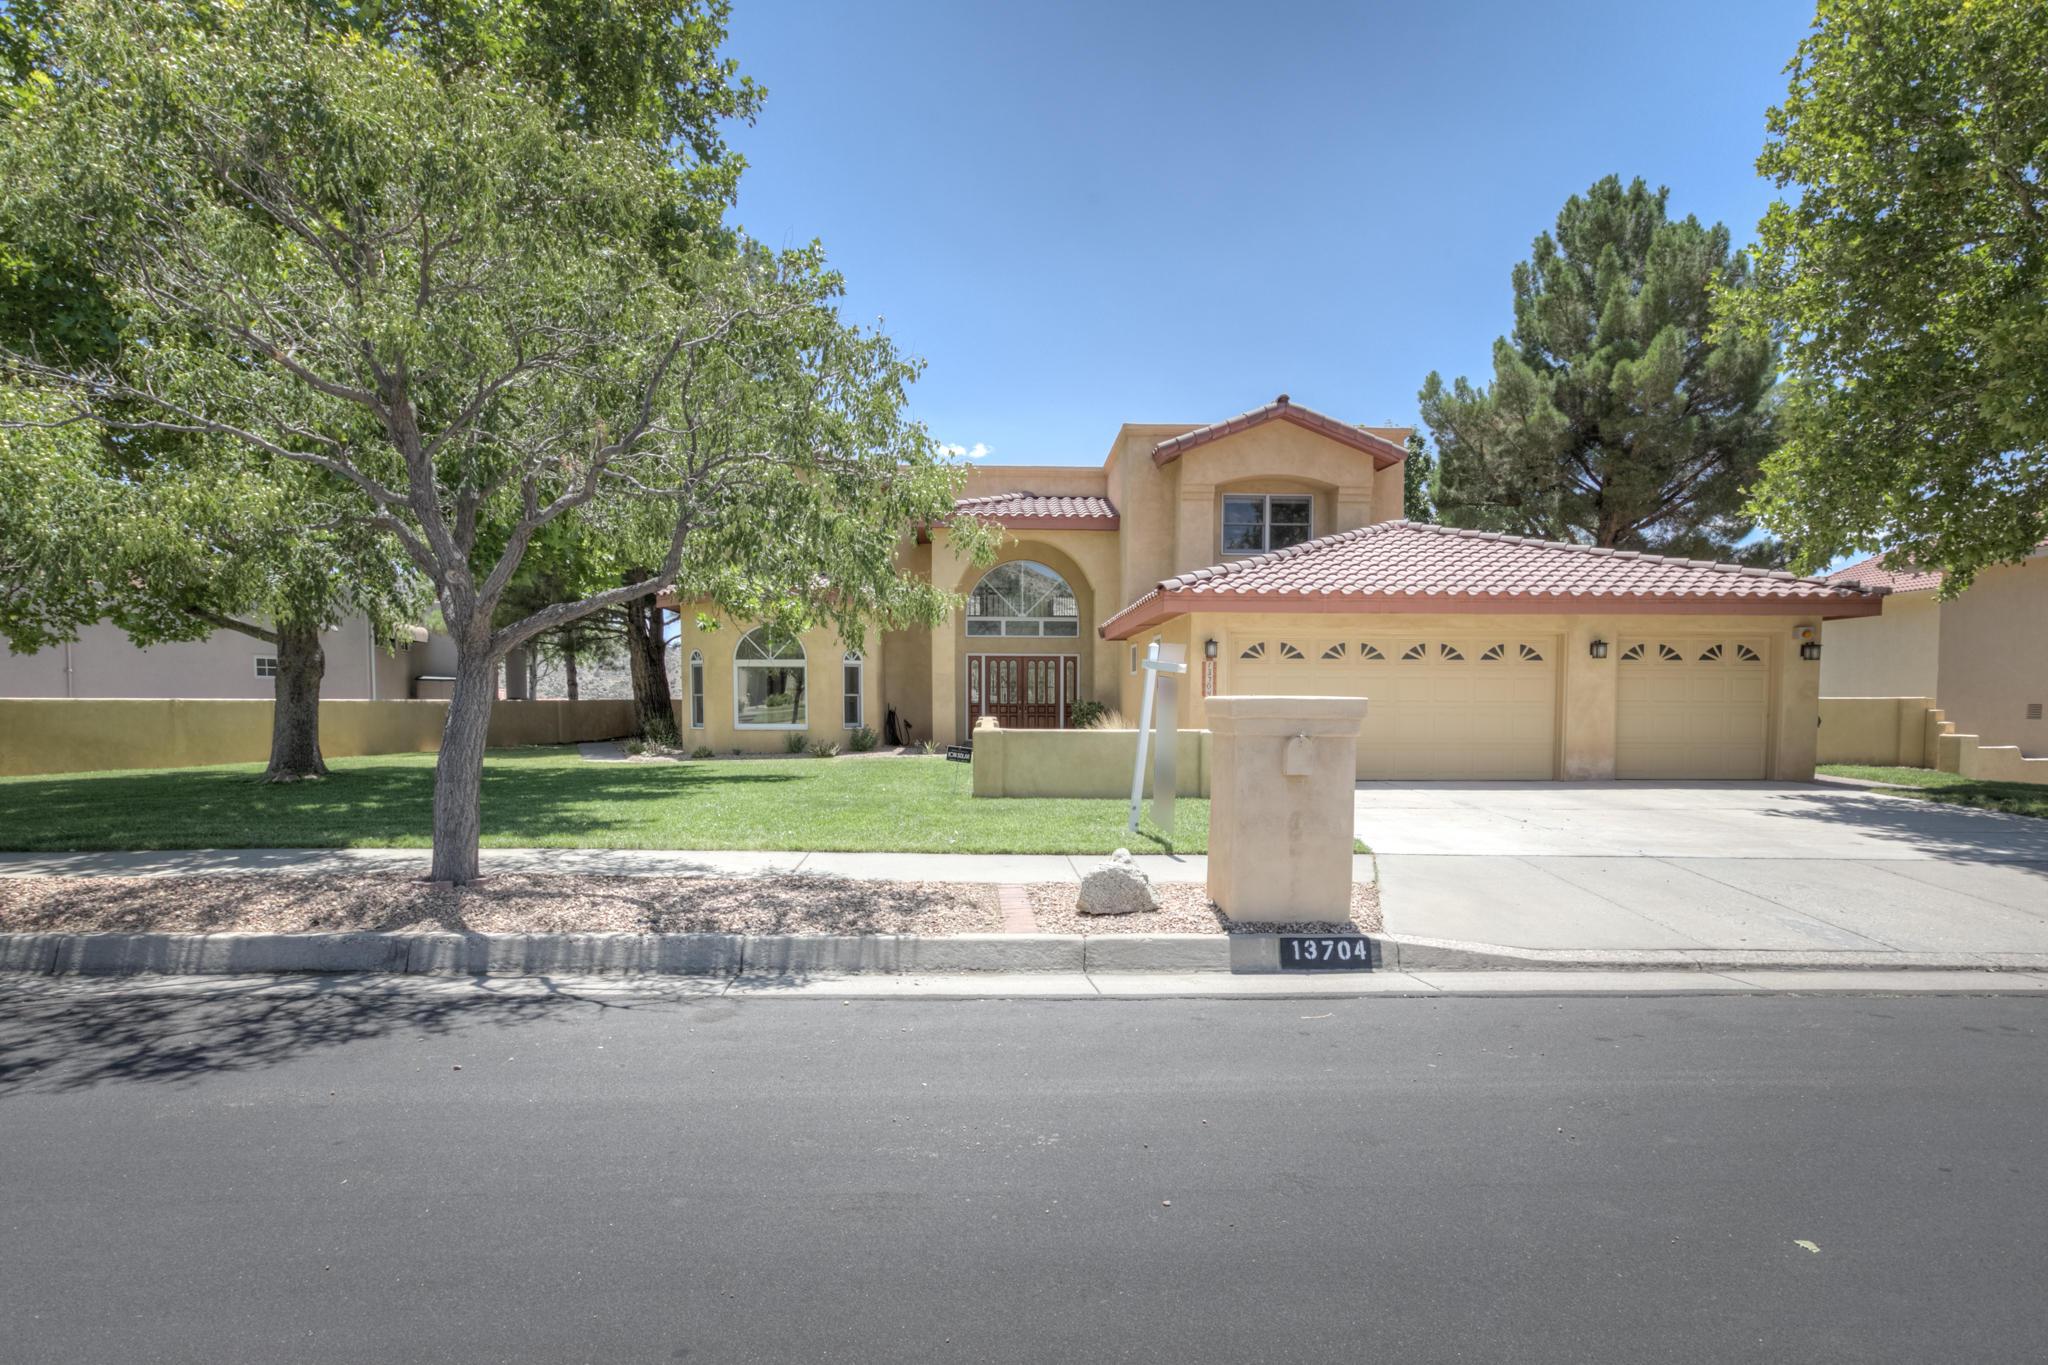 13704 CRESTED BUTTE Drive NE Property Photo - Albuquerque, NM real estate listing